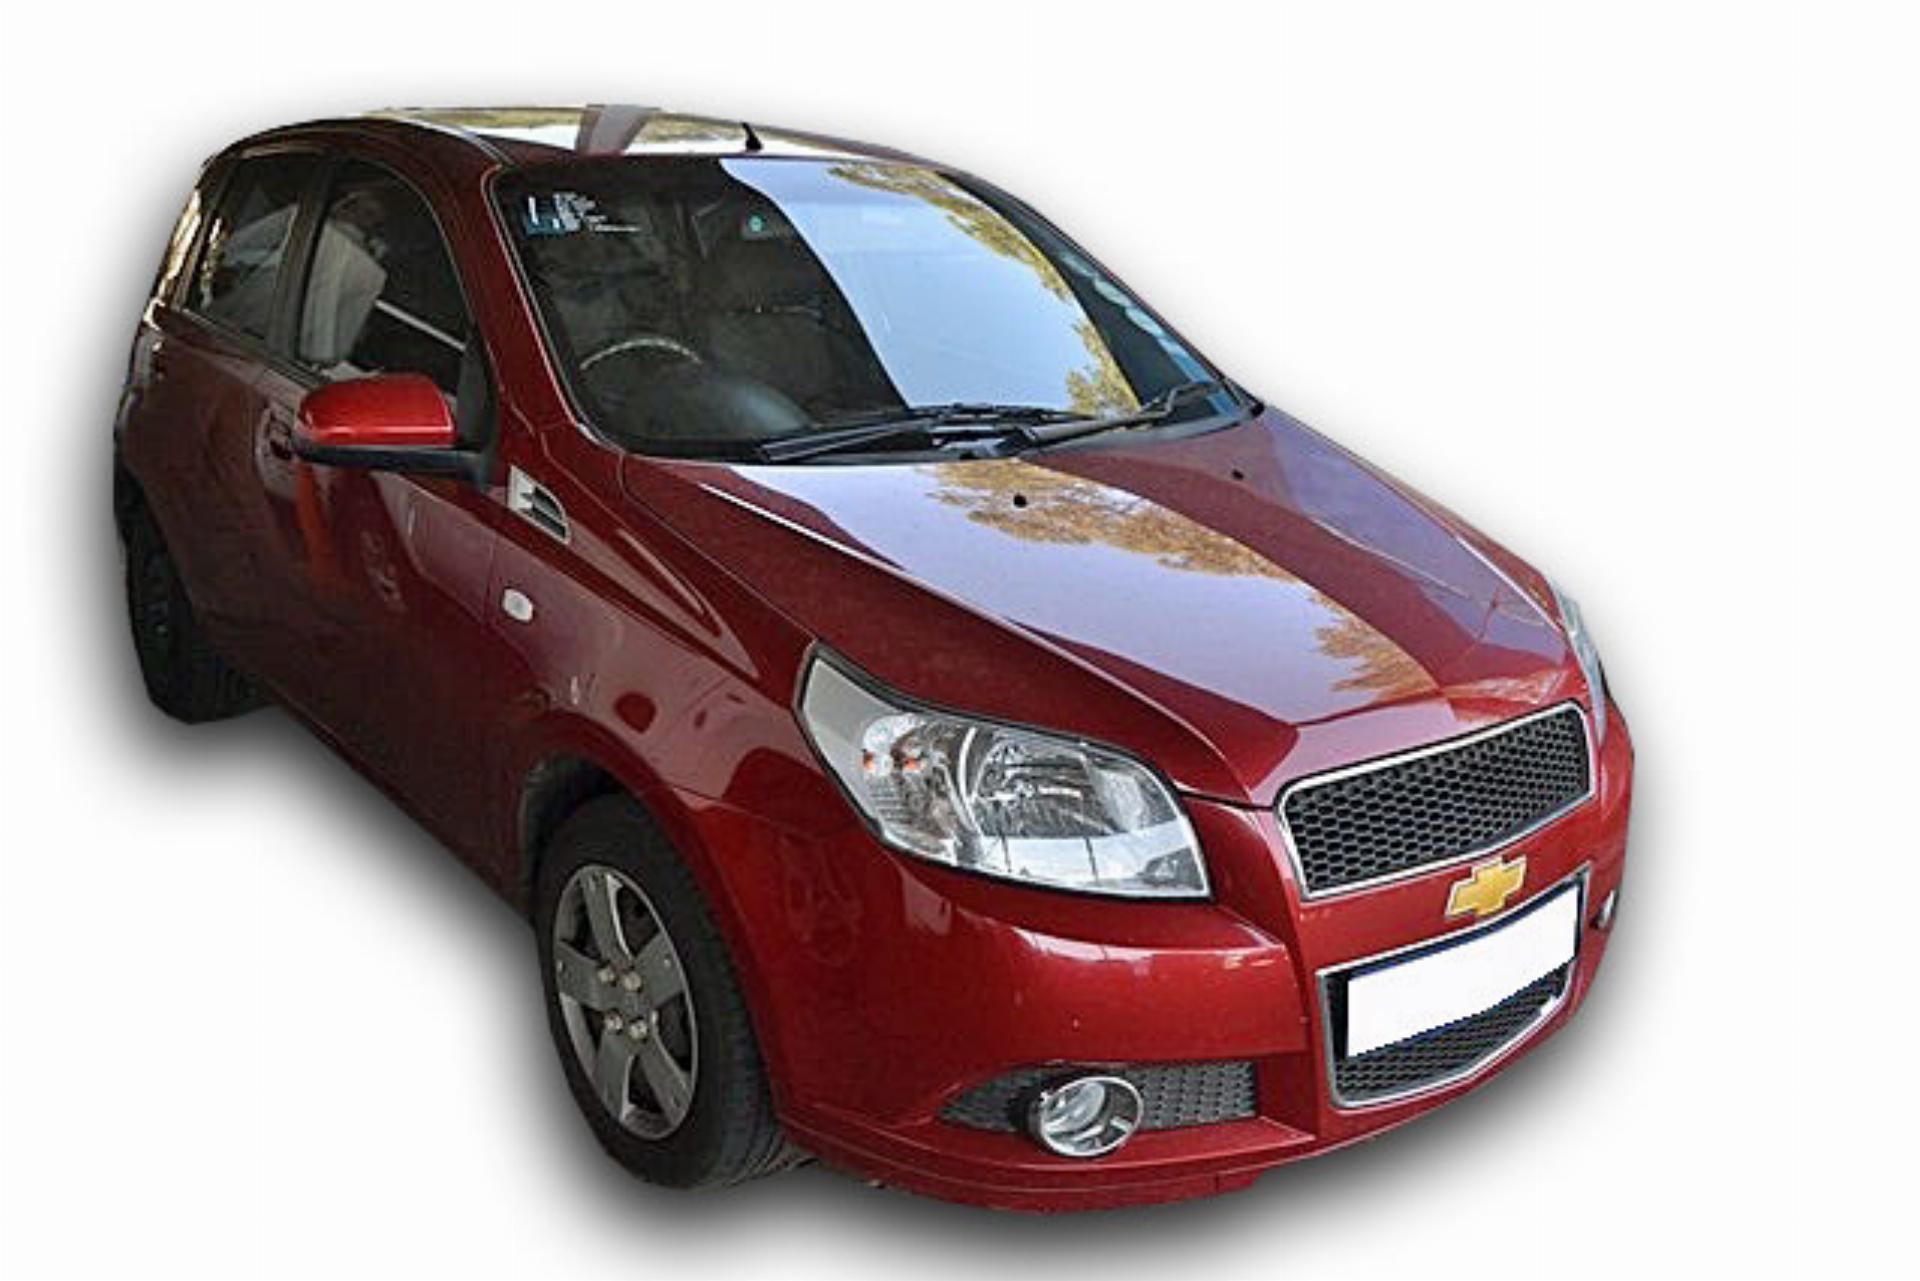 Chevrolet Aveo 1.6 LS 5DR